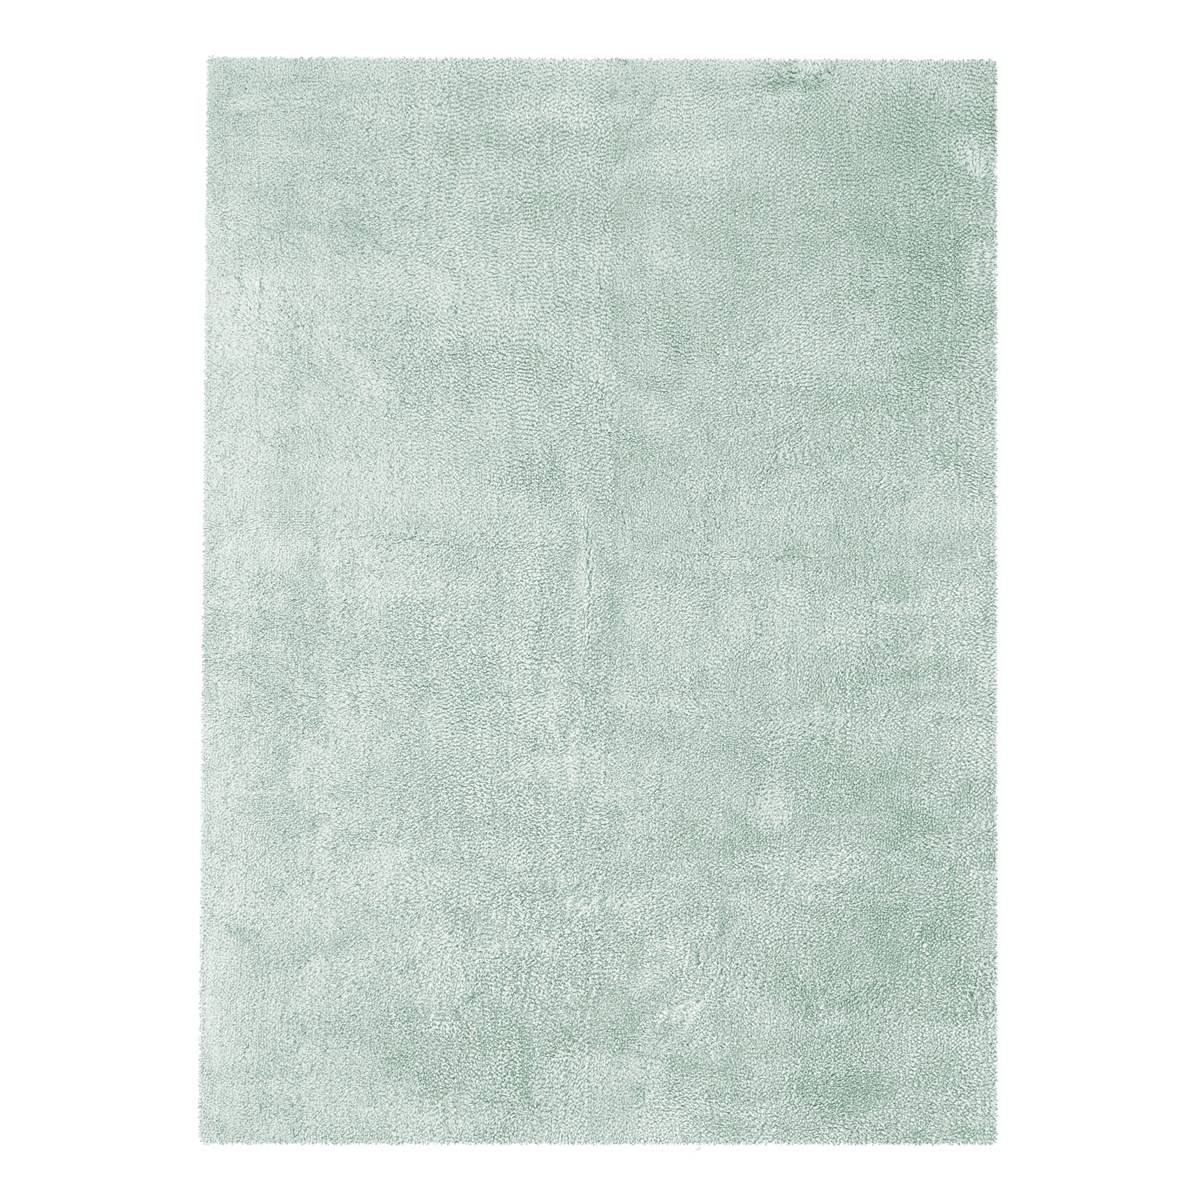 Novatrend Tapis shaggy en Polyester Bleu ciel 160x230 cm